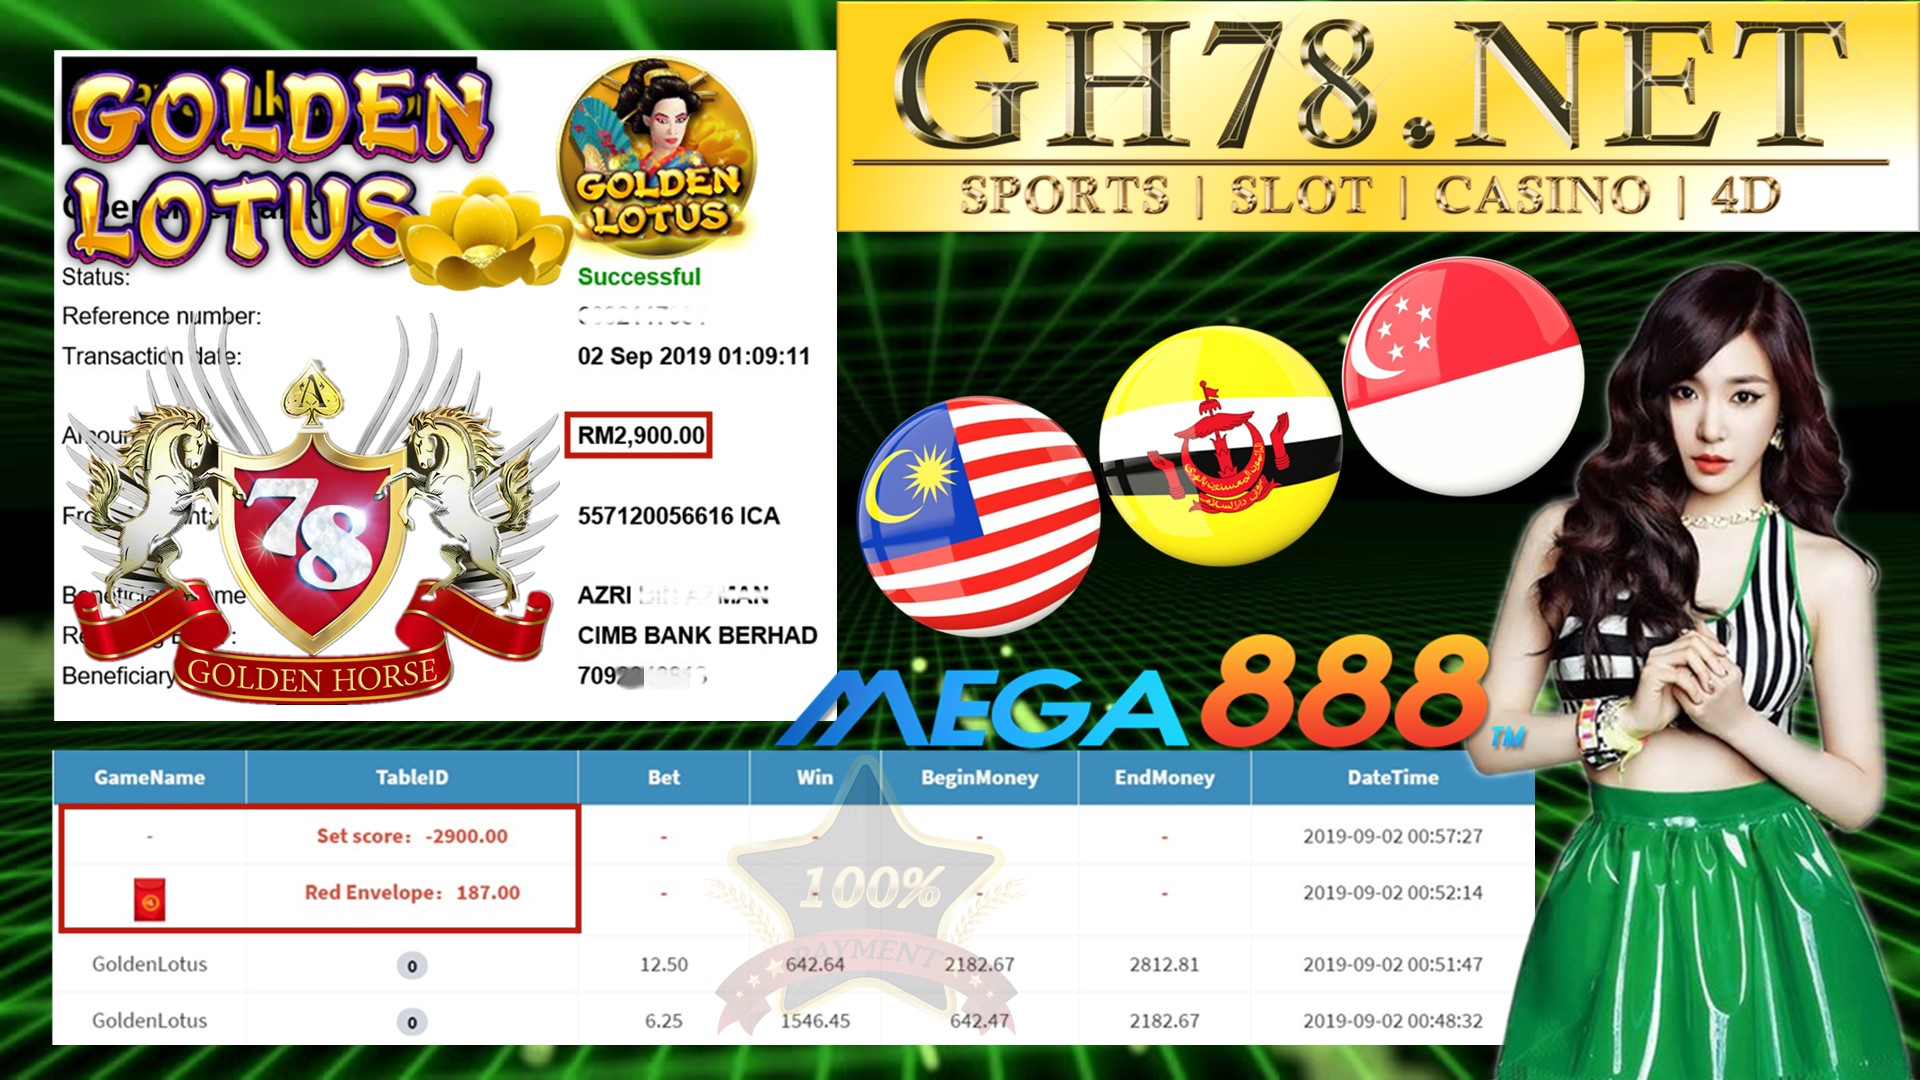 MEMBER MAIN GAME MEGA888 FT.GOLDENLOTUS MINTA OUT RM2,900